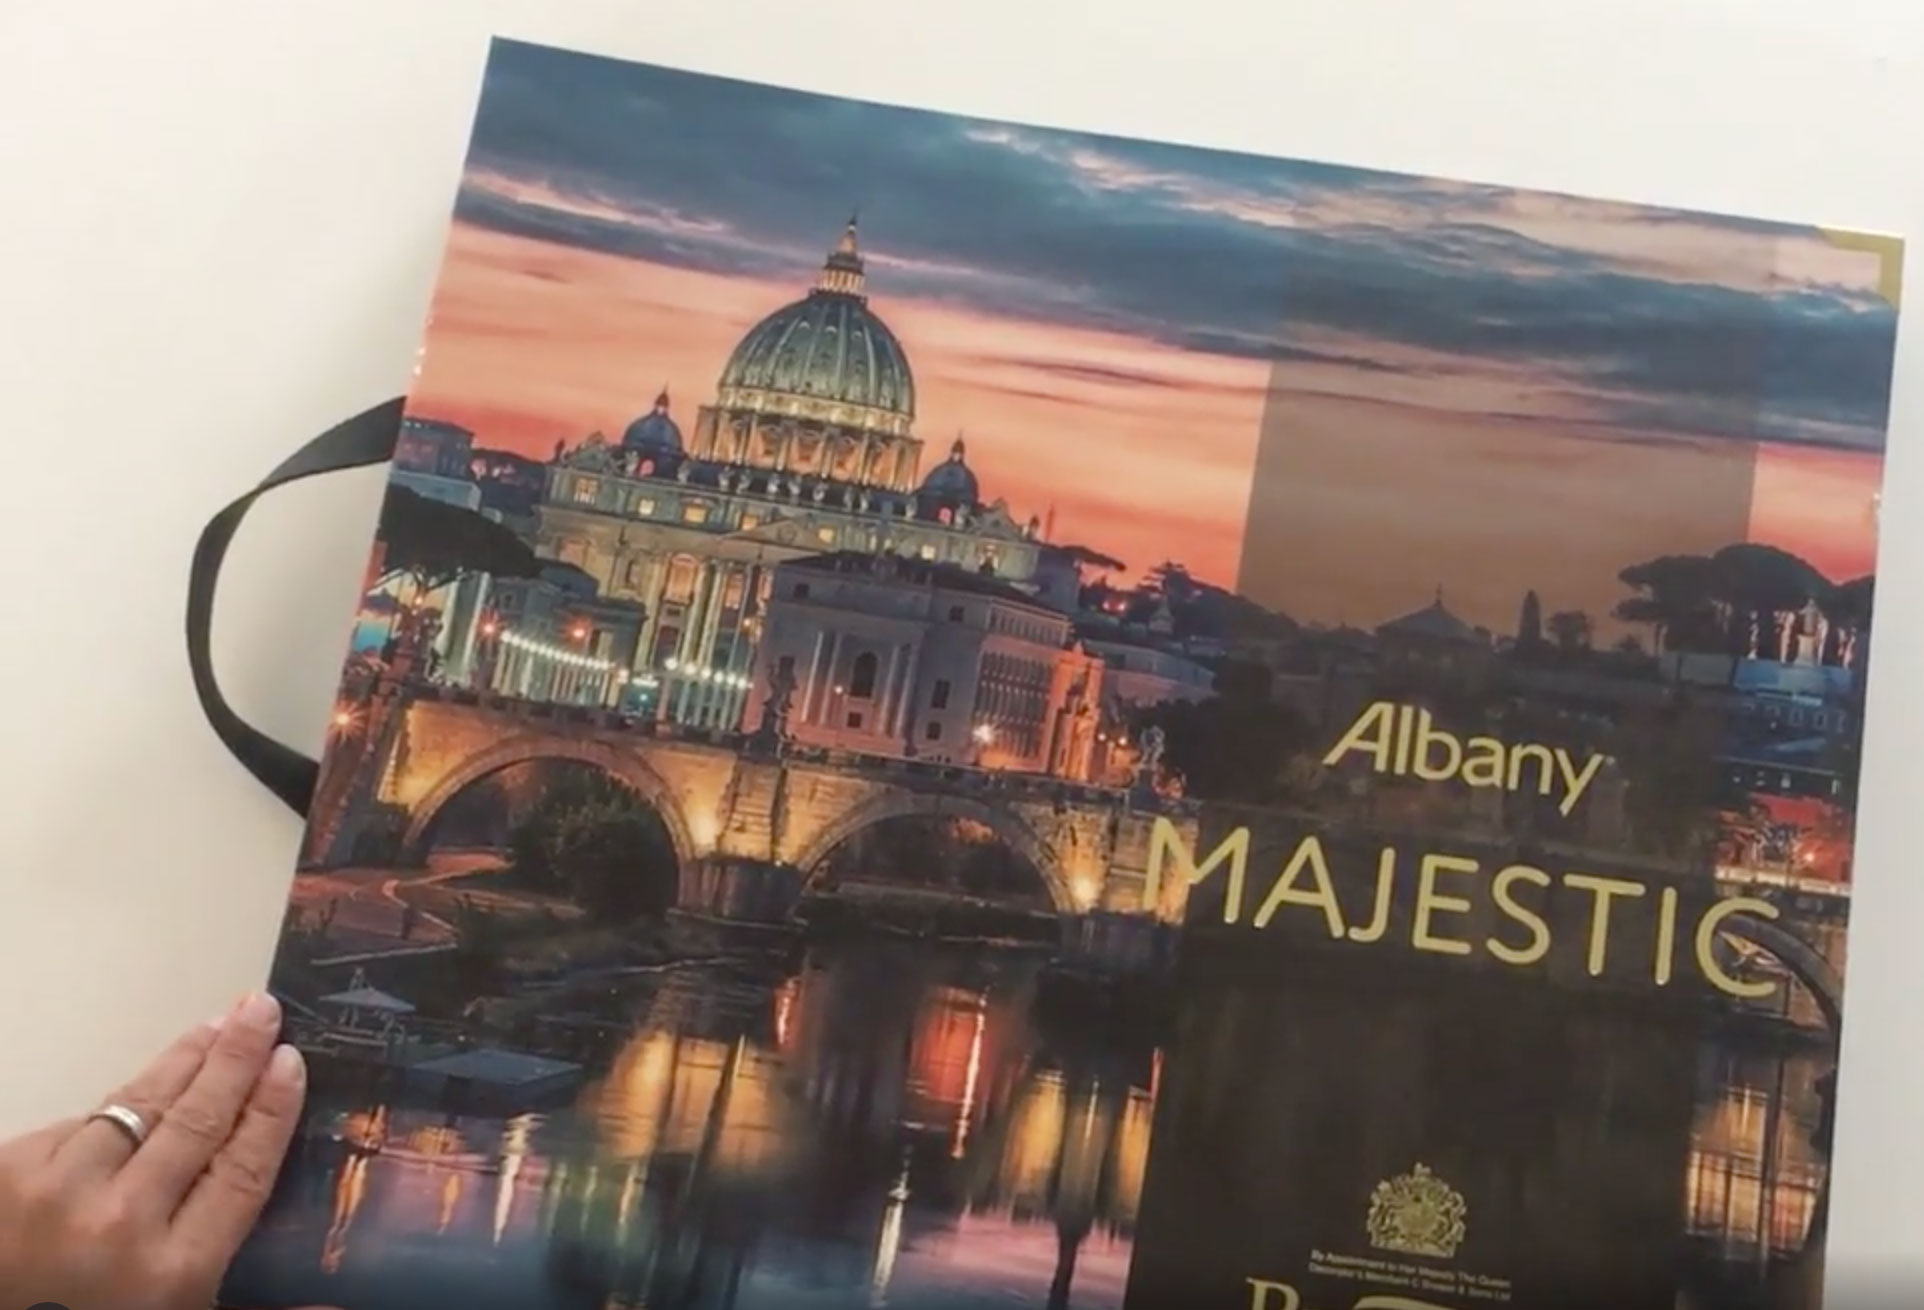 Wallpaper book club – Albany Majestic